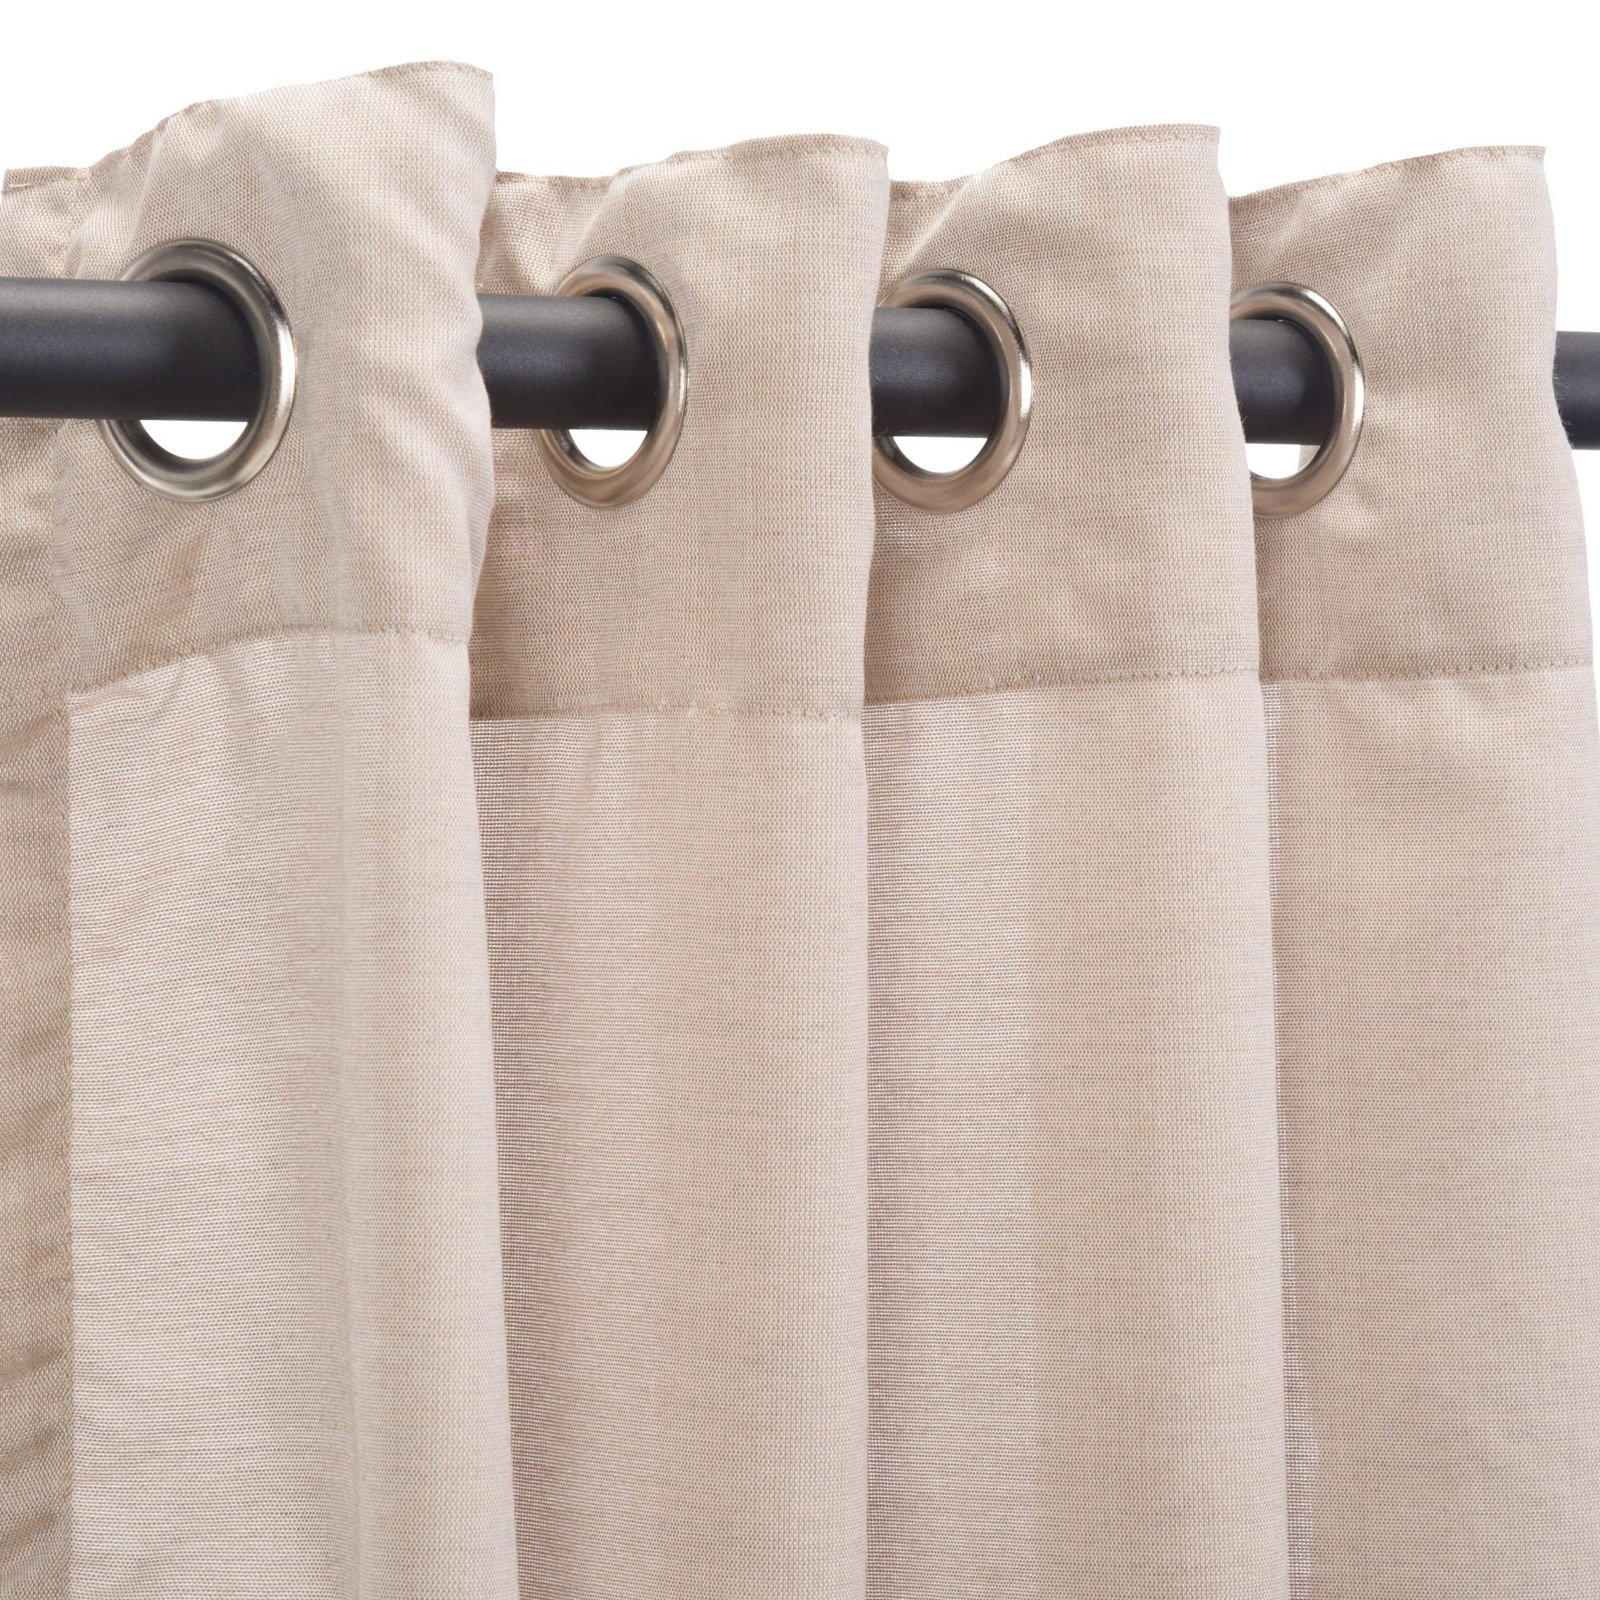 Pawleys Island Sheer Sunbrella Grommet Top Outdoor Curtain